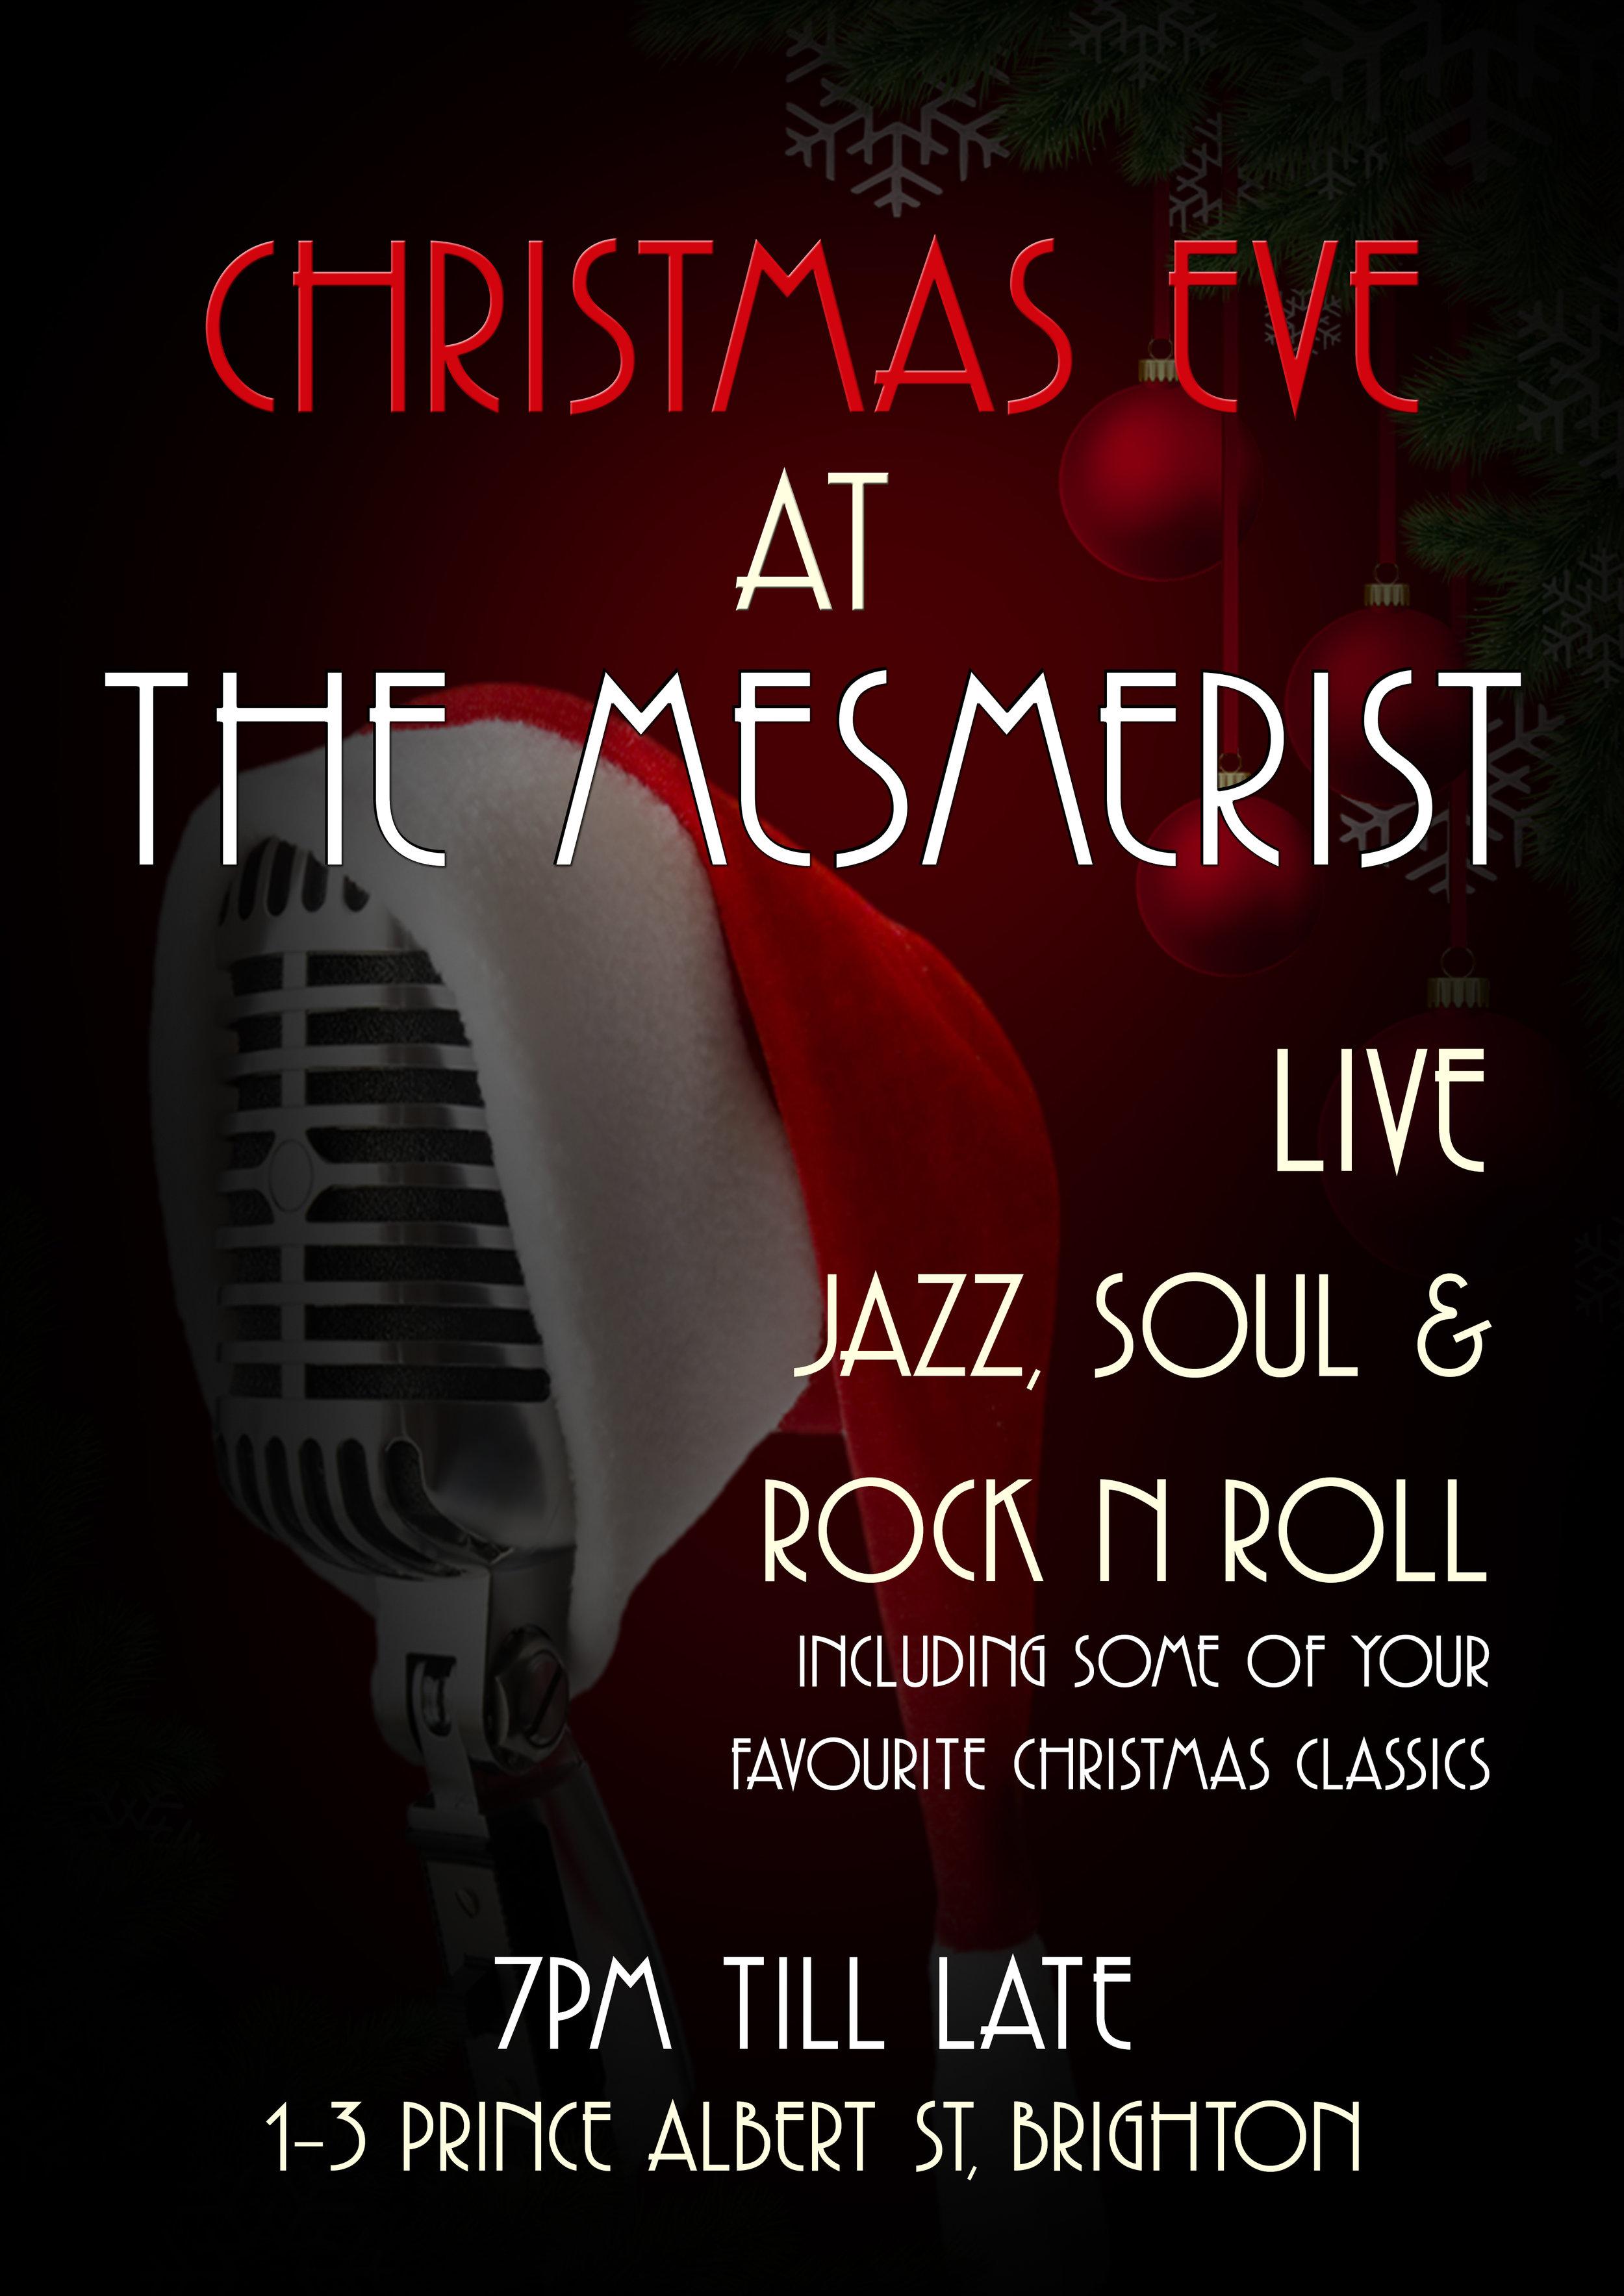 Christmas Eve at The Mesmerist.jpg